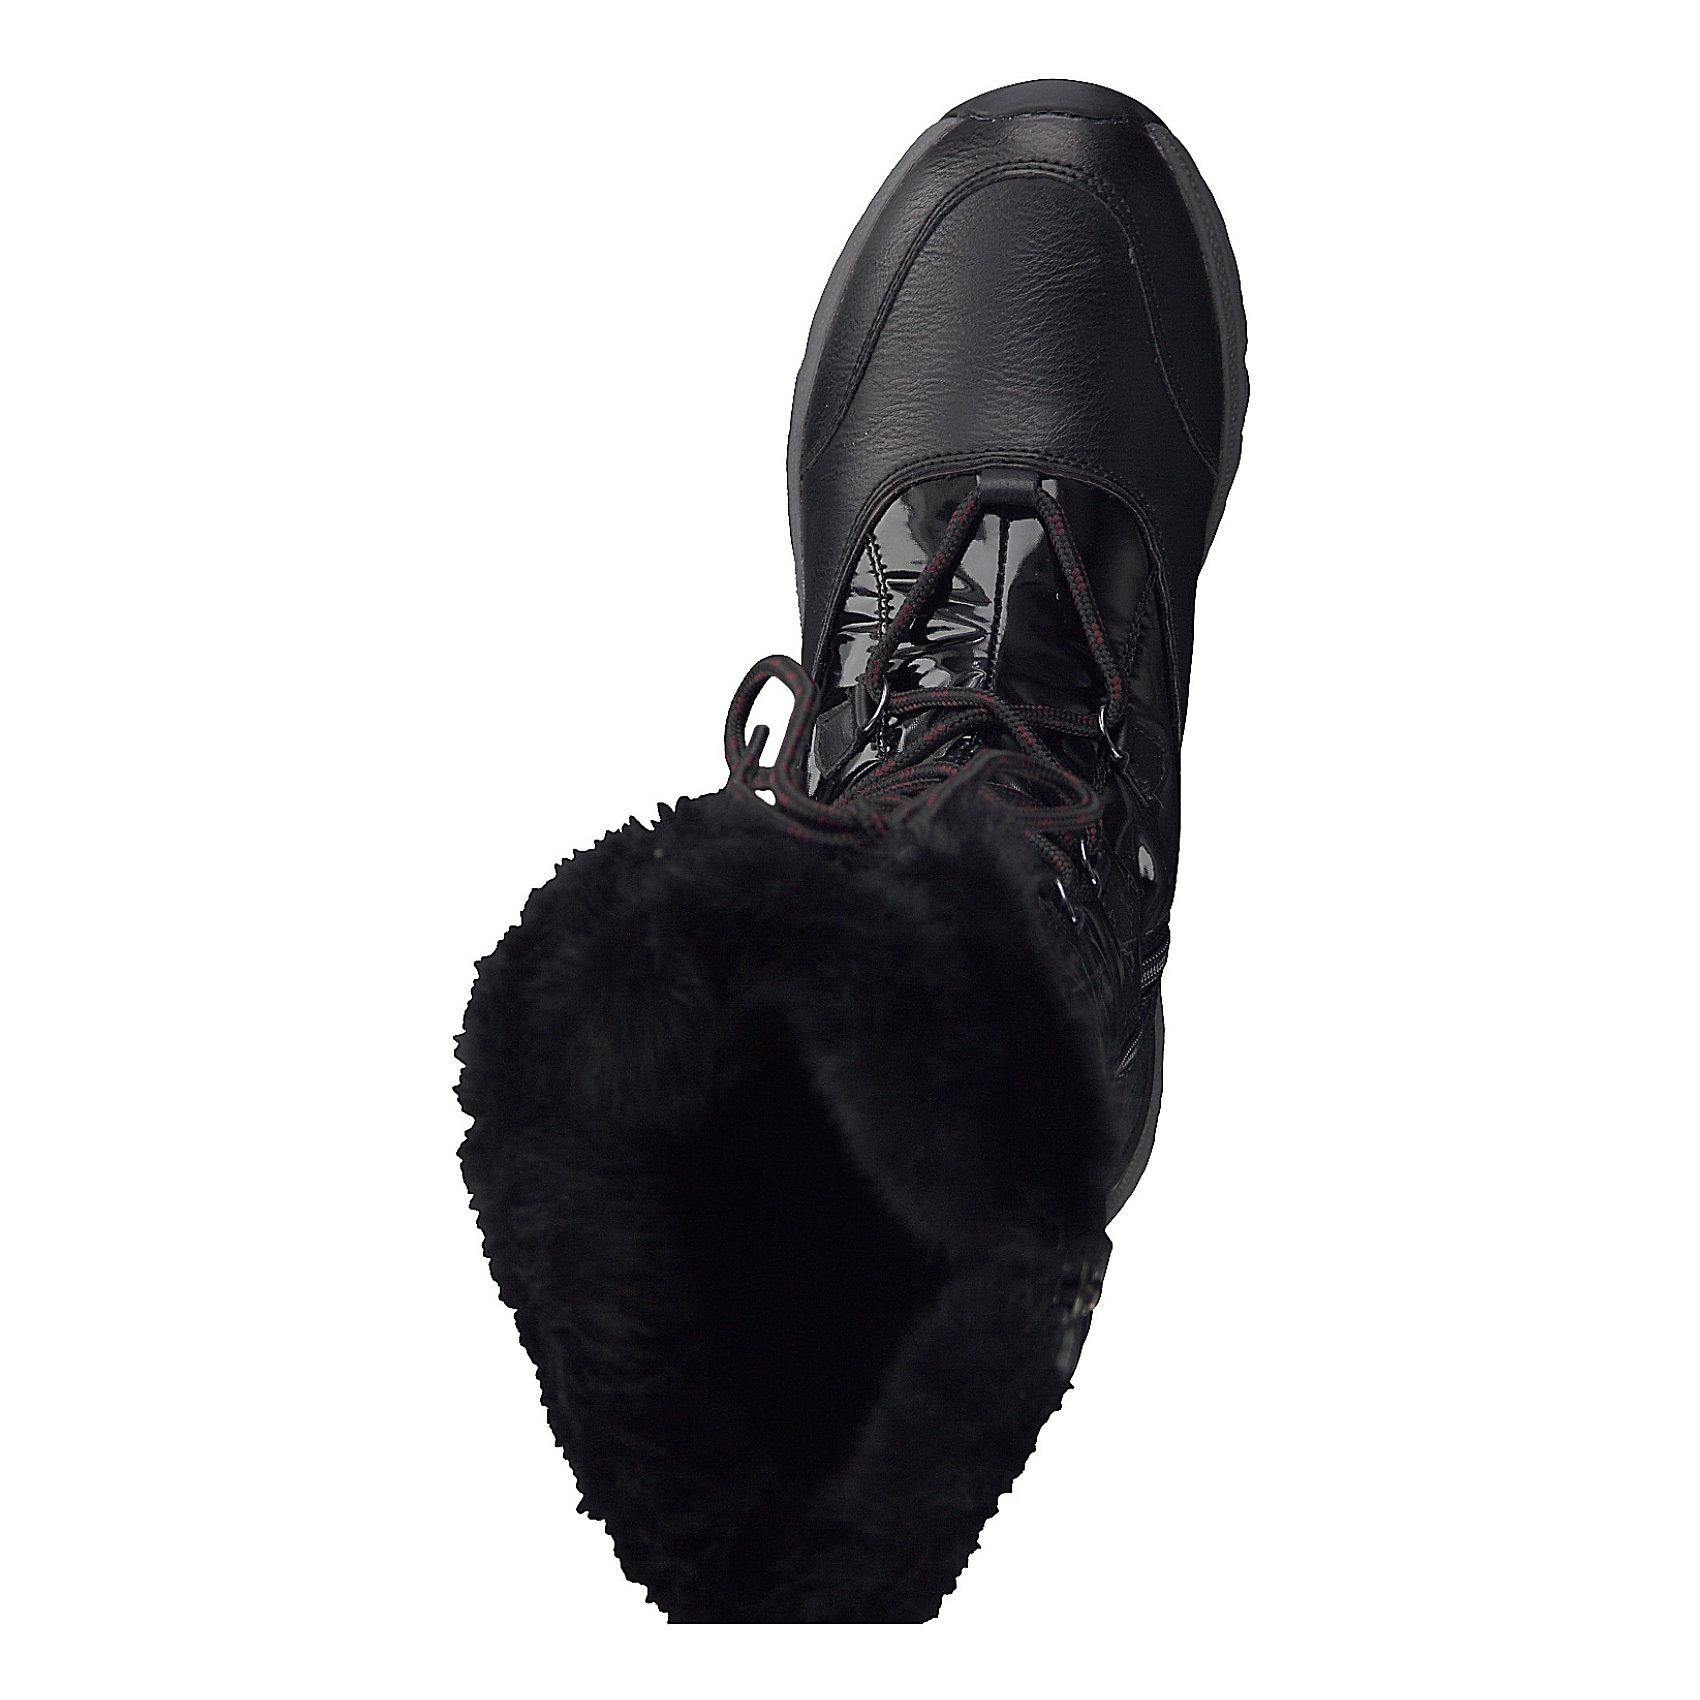 Neu MARCO TOZZI TOZZI TOZZI Feel + Tex Winterstiefel 8515842 für Damen schwarz creme 978549